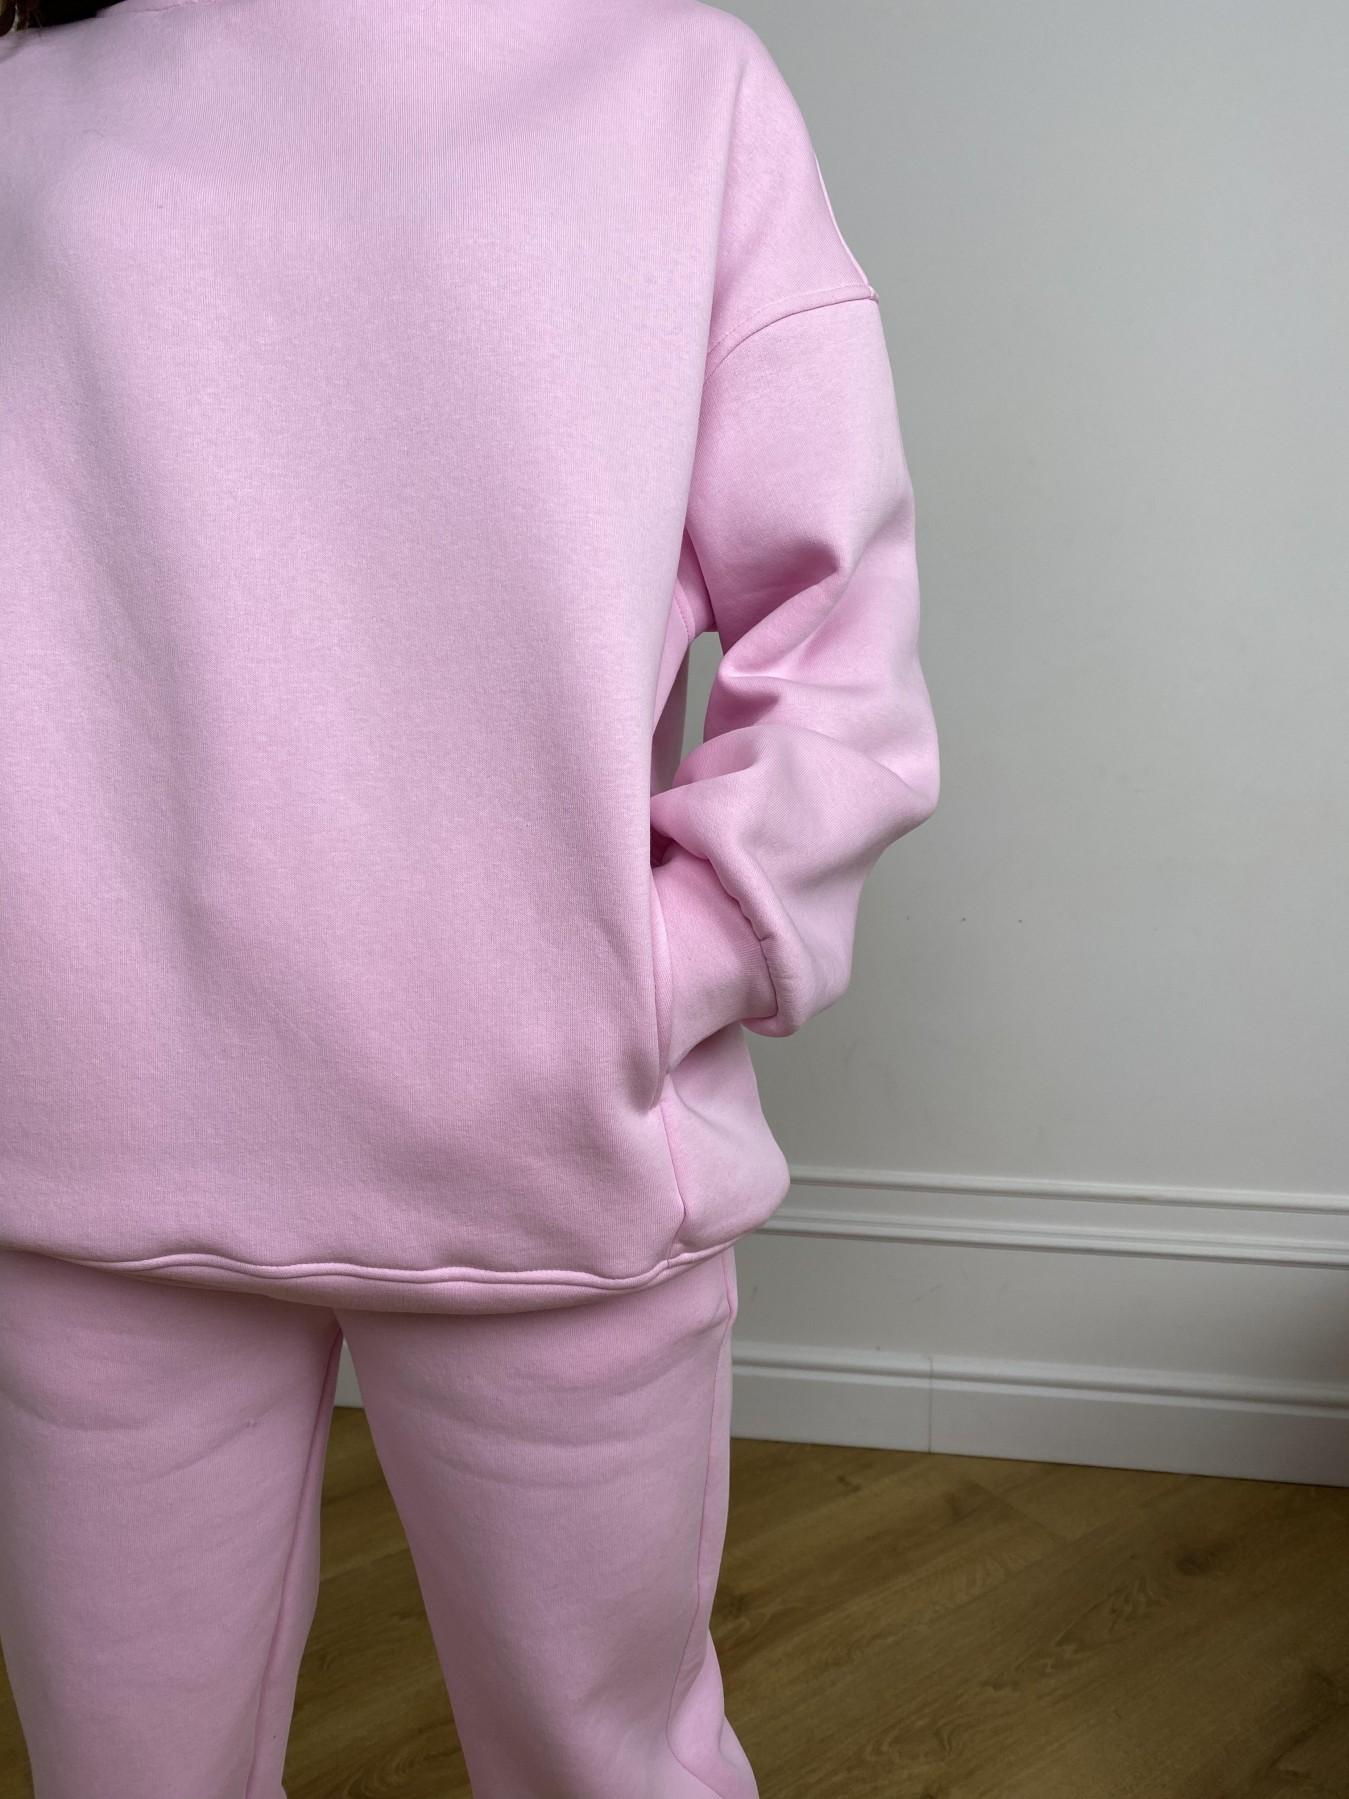 Марион костюм в  стиле Oversize  3х нитка 9651 АРТ. 46922 Цвет: Розовый - фото 7, интернет магазин tm-modus.ru